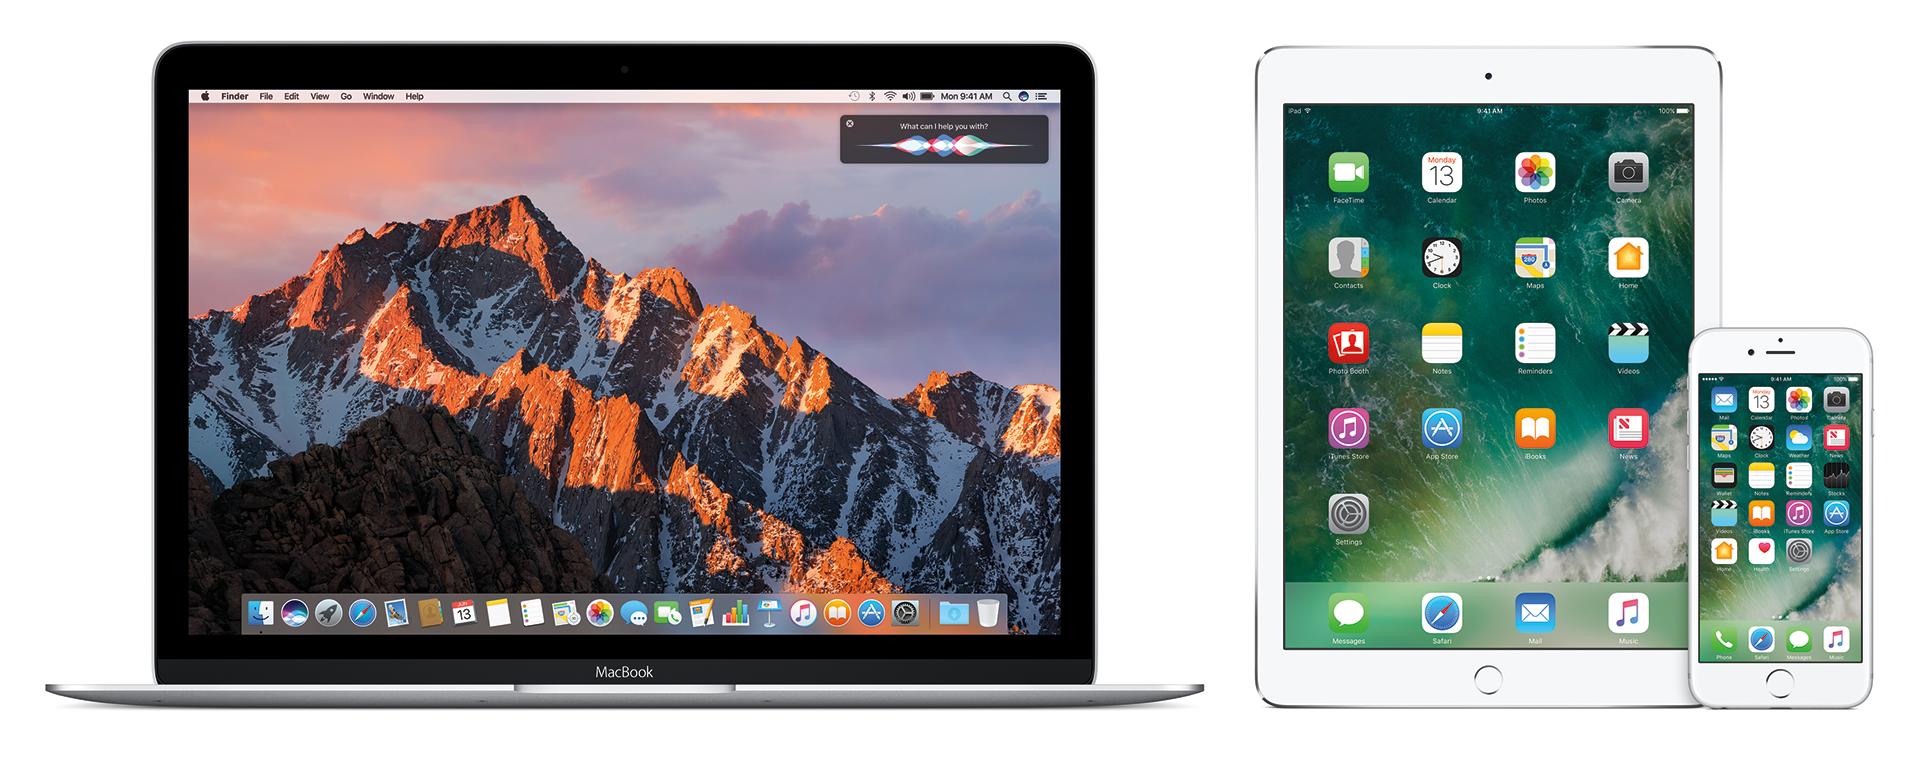 Sierra download mac 10 os MacOS High